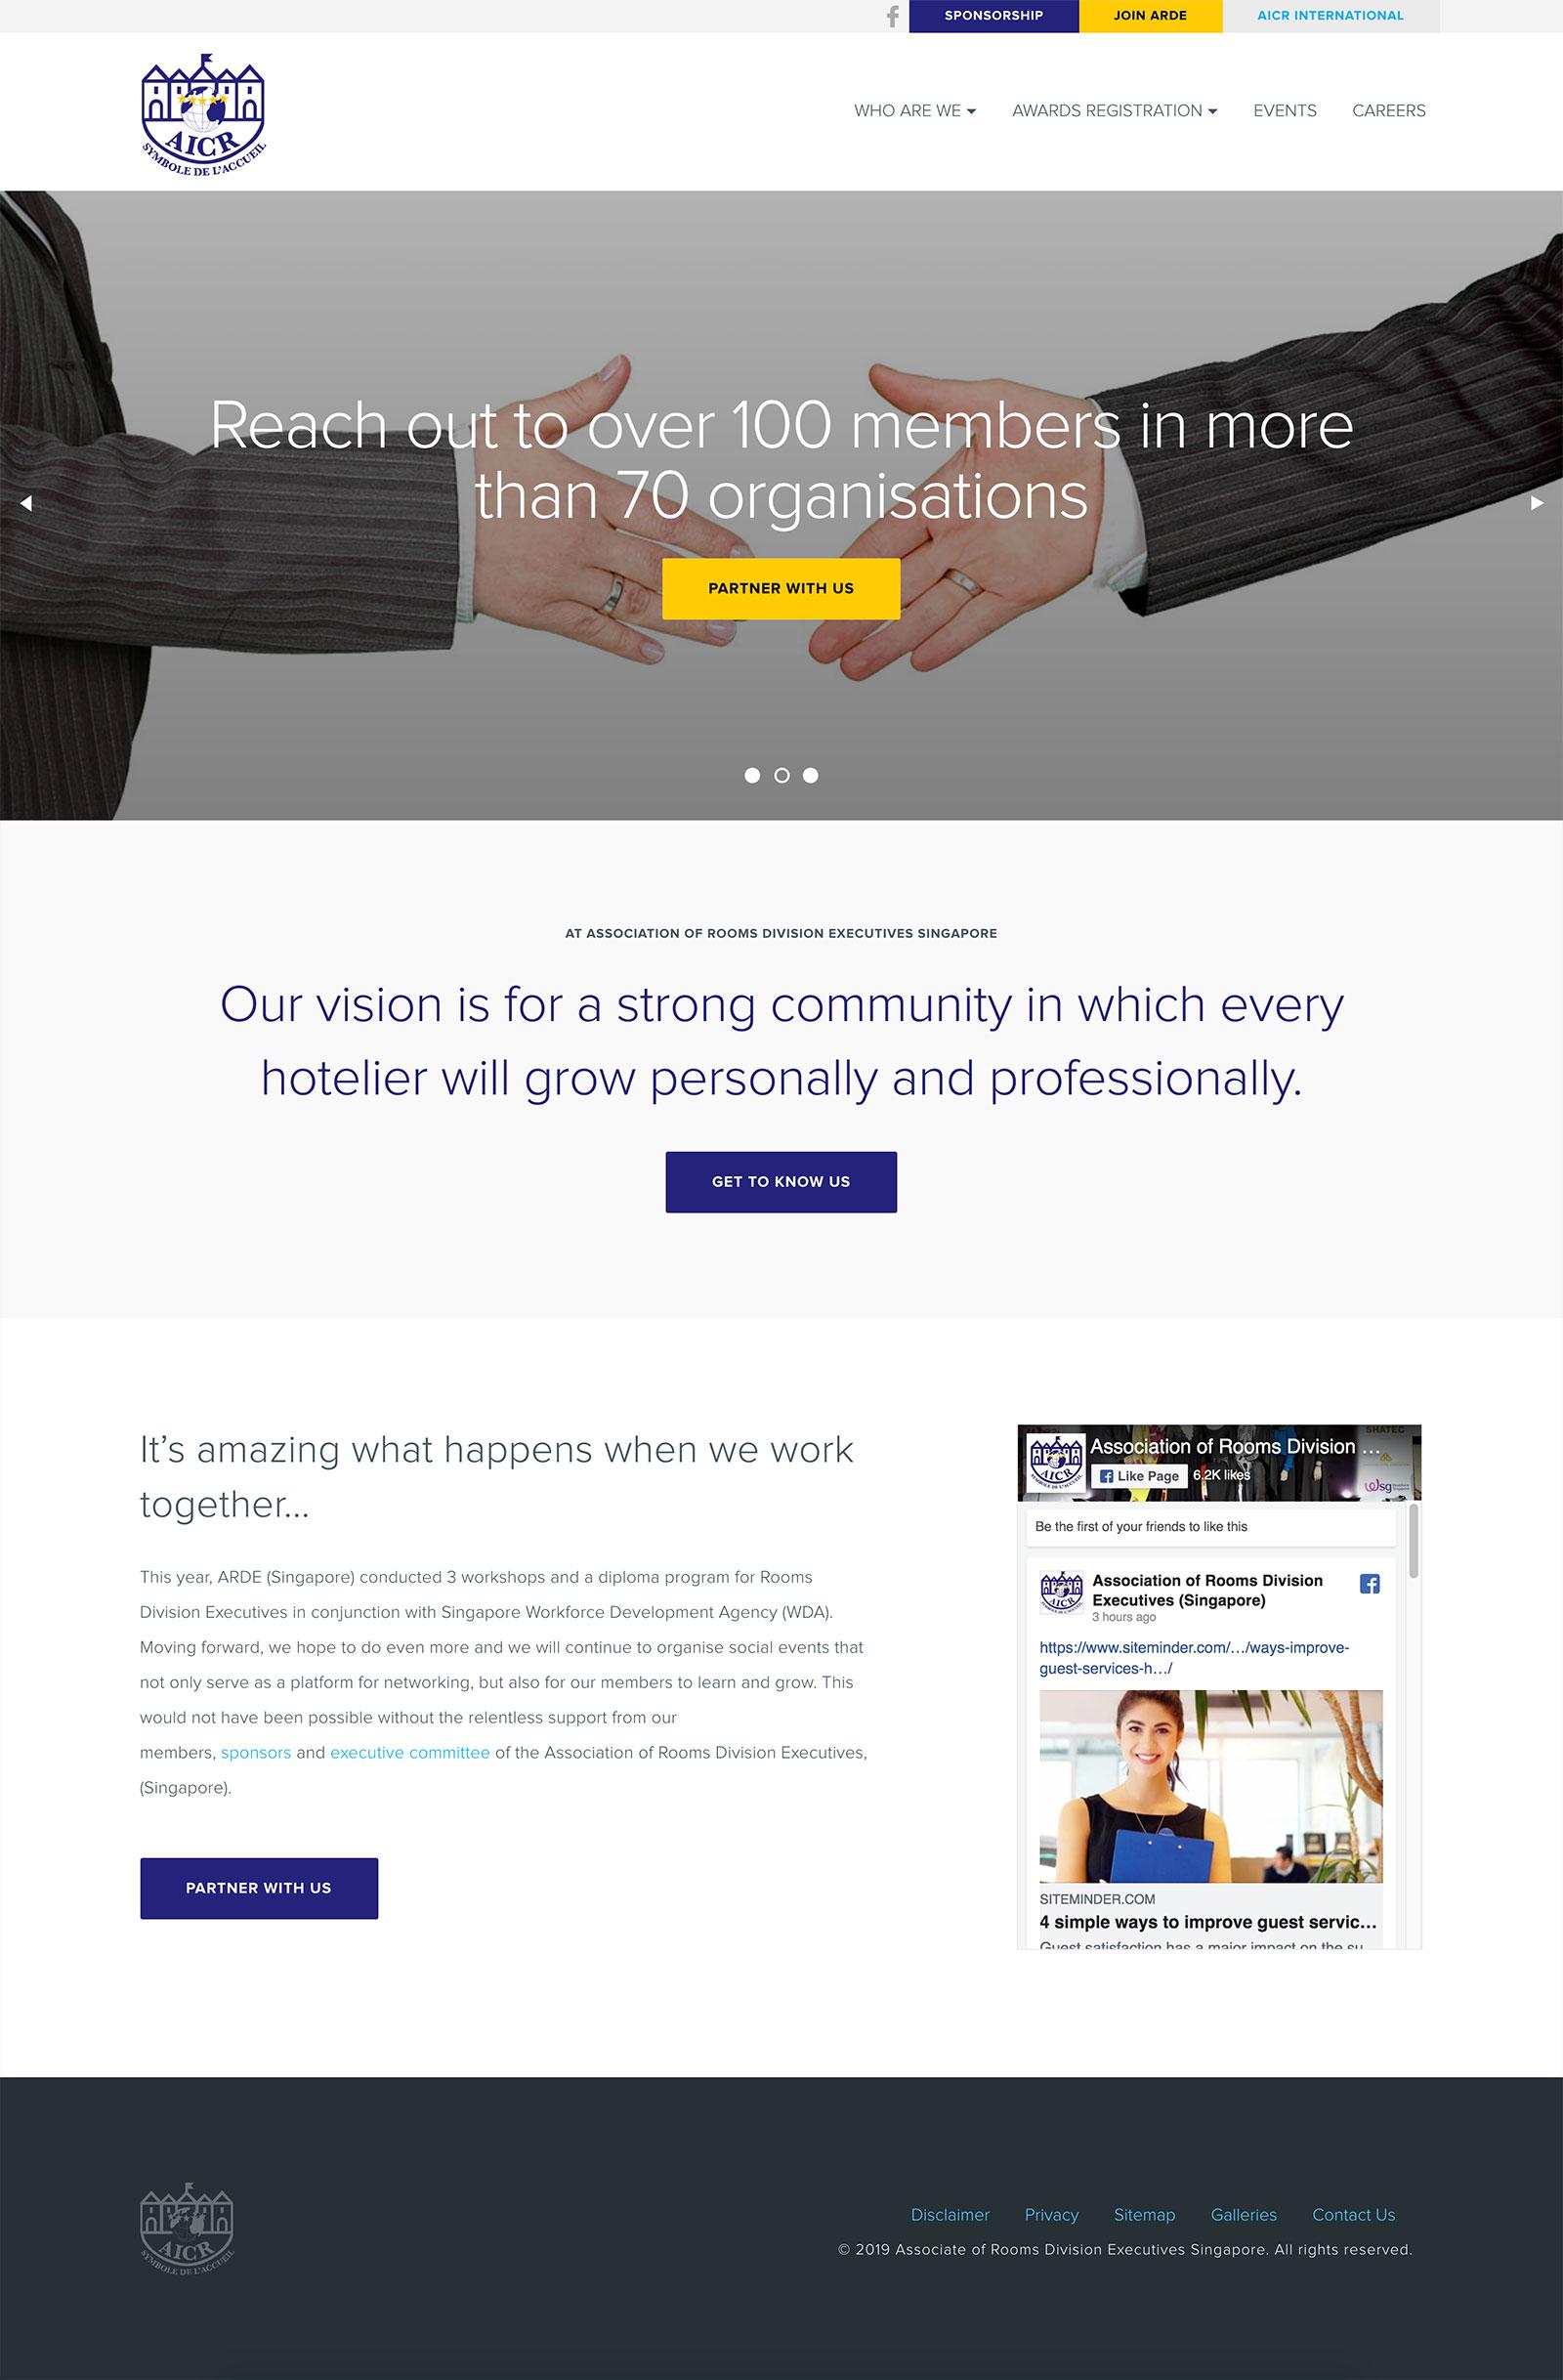 AICR Singapore - Homepage